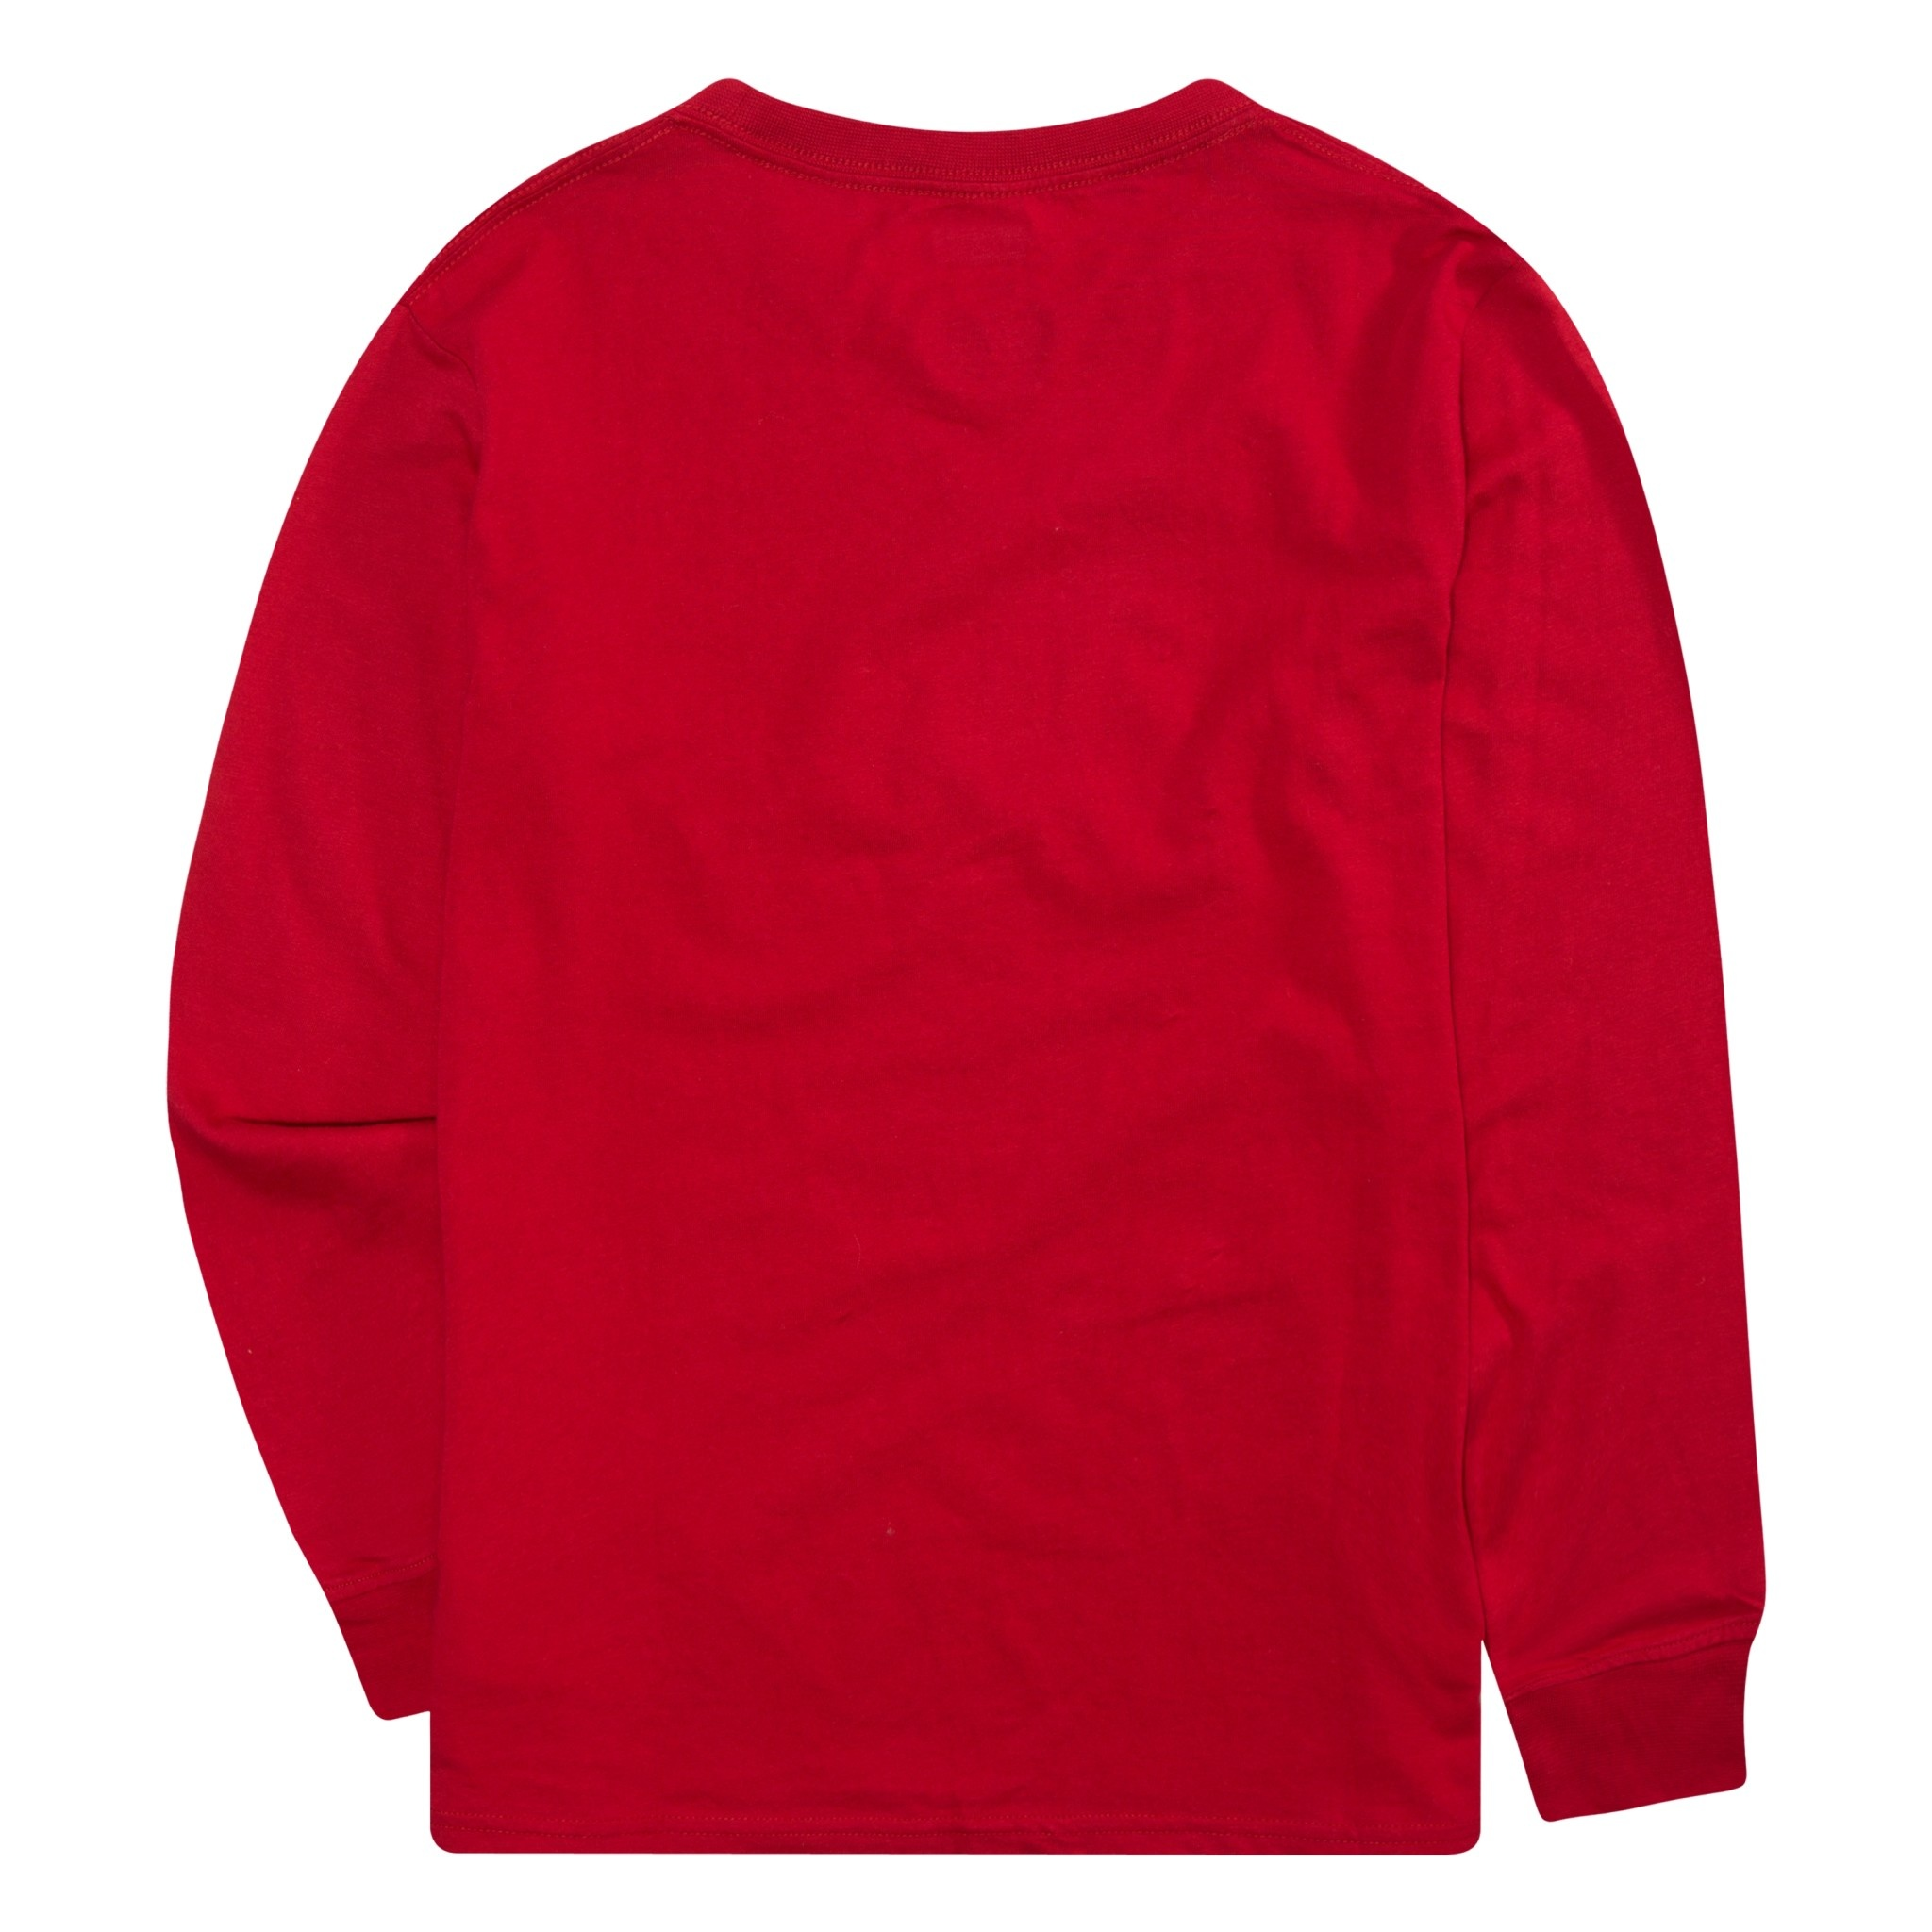 T-shirt Longsleeve red